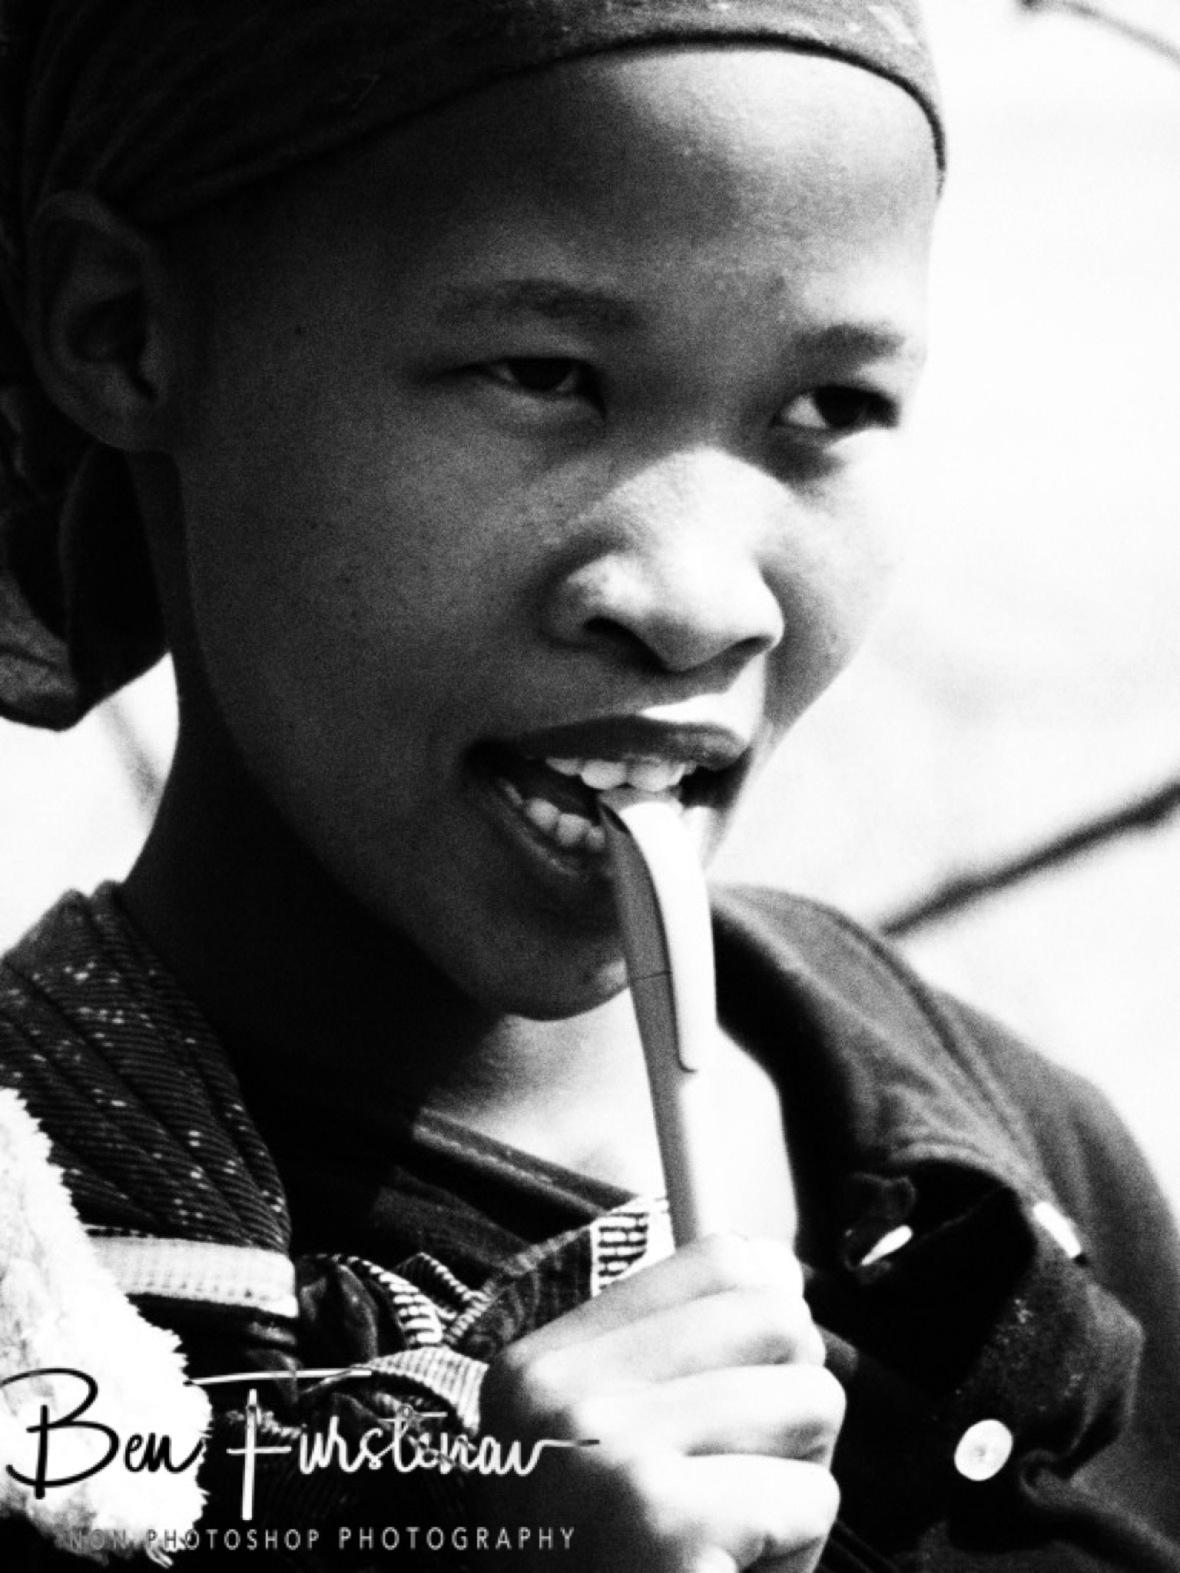 Ball pen usage, Kalahari desert, Botswana